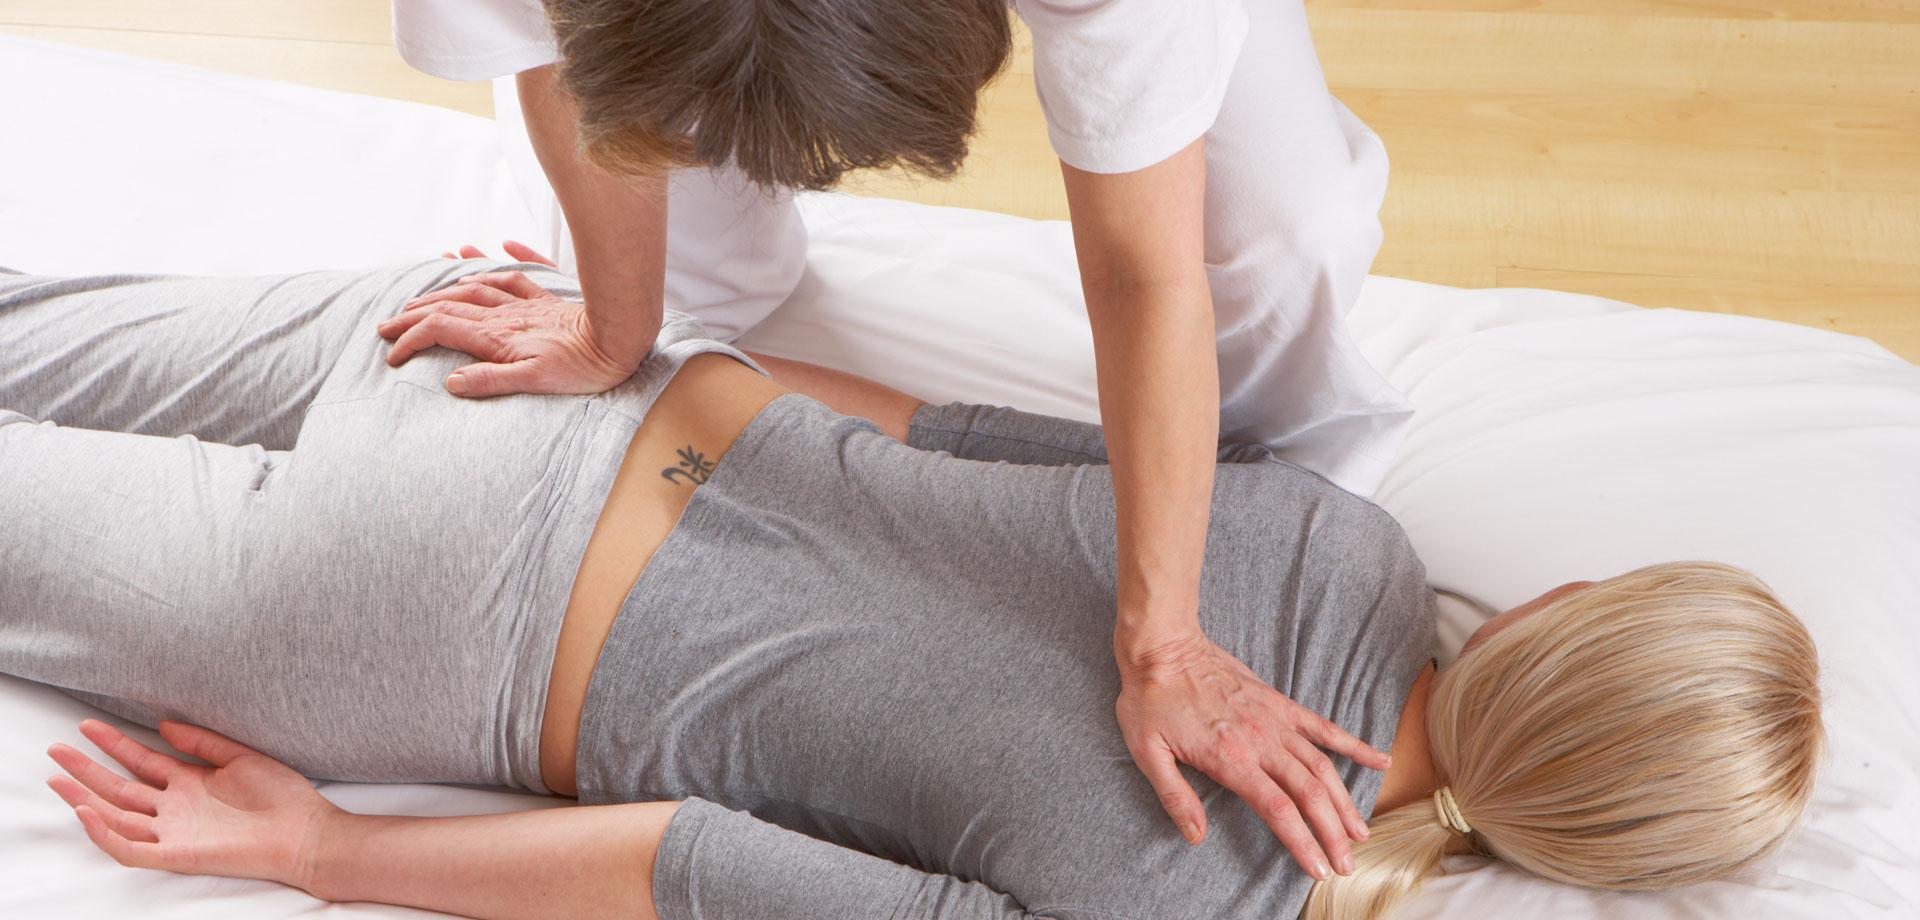 Acamtherapy – Shiatsu + Acupuncture